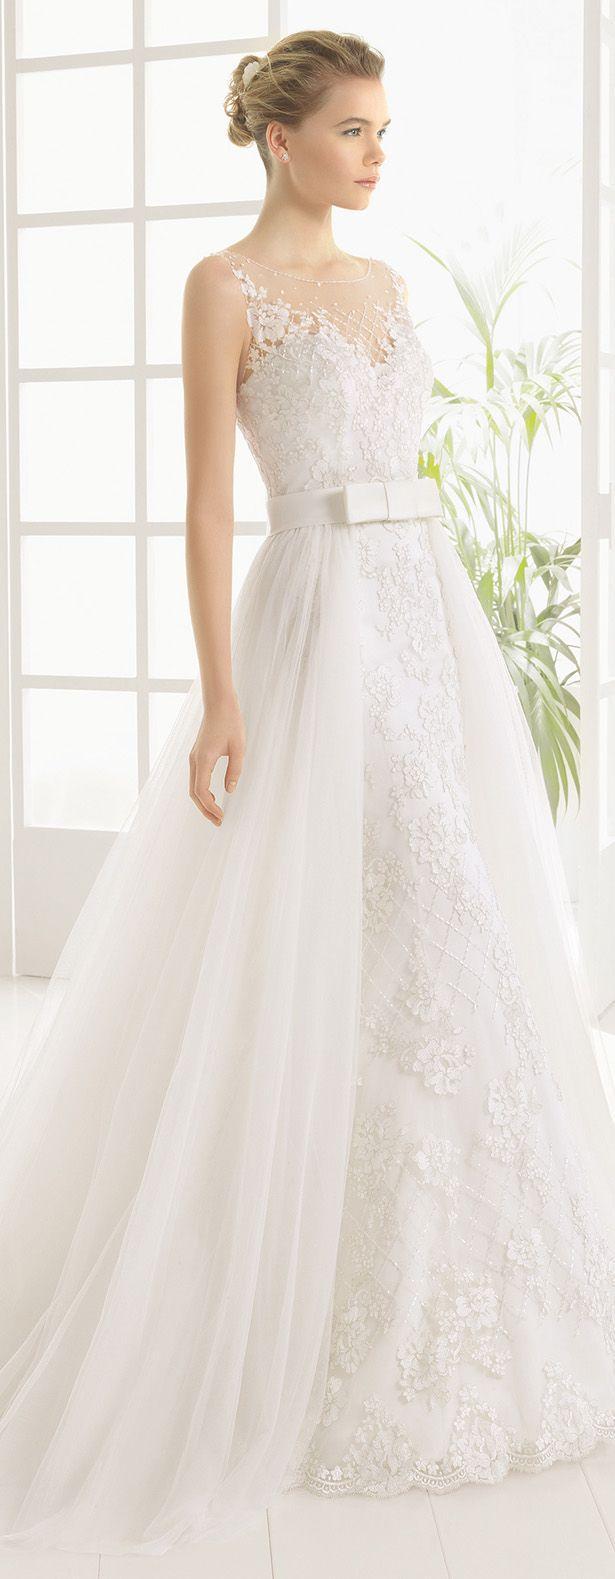 Wedding - Bridal Trends: Wedding Dresses With Detachable Skirts